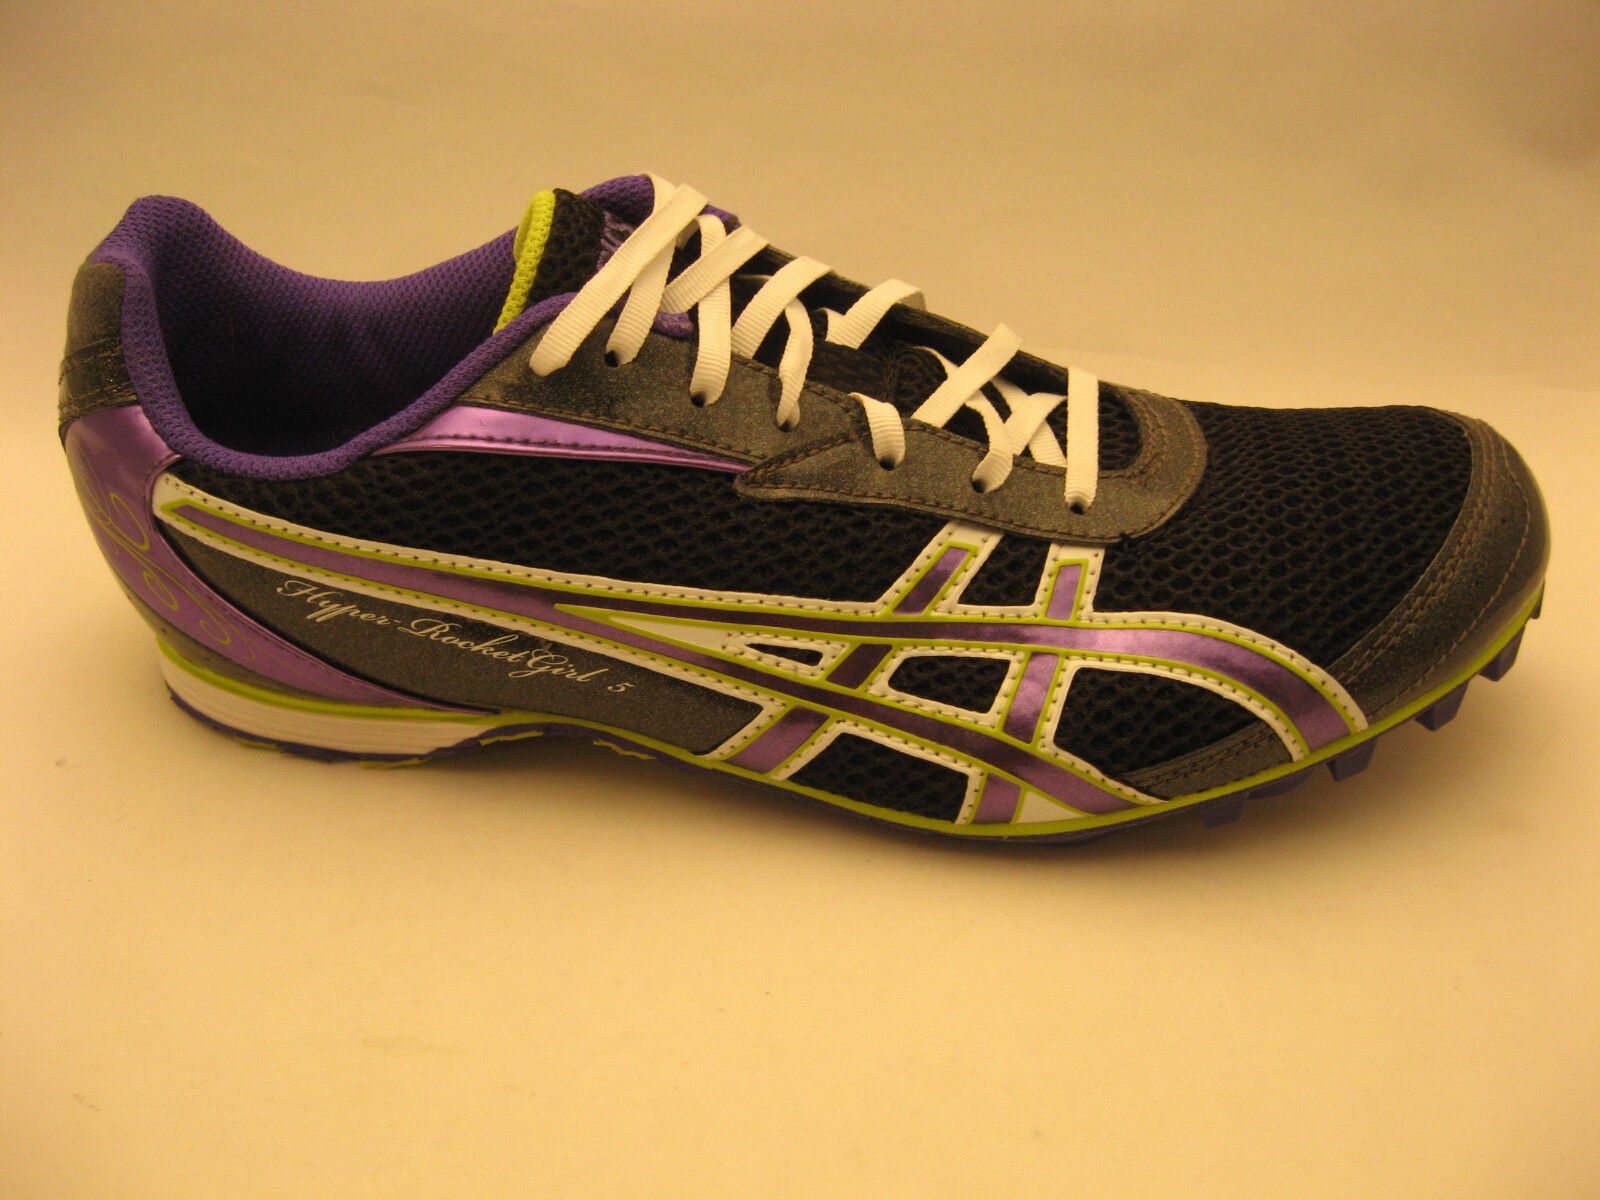 ASICS femmes Hyper Rocket Girl 5 Track & Field chaussures 10 Storm Violet Lime G154N